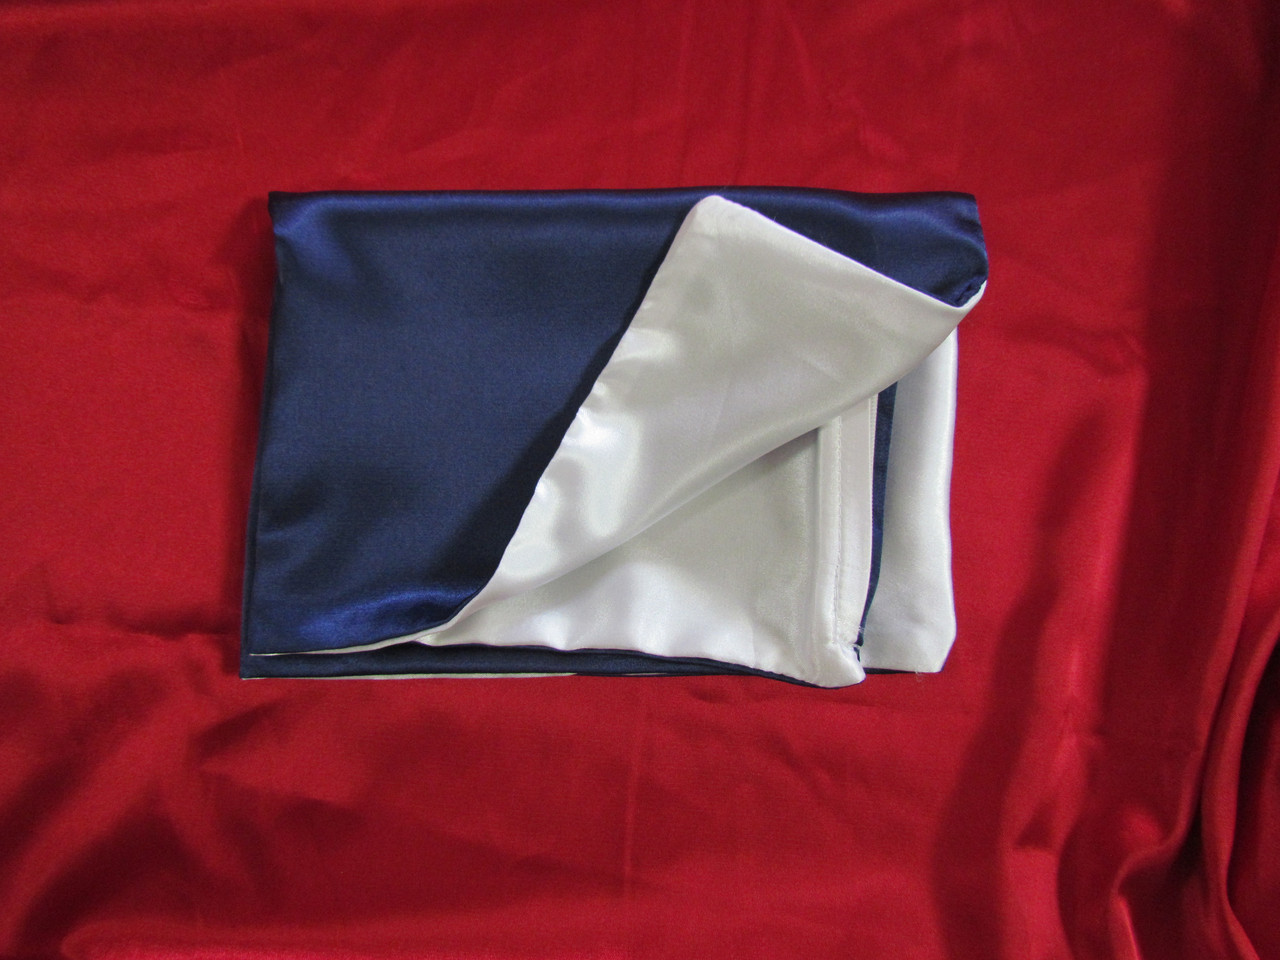 Наволочка двухцветная (бело-синяя) для сублимации, 20х30 см, атлас